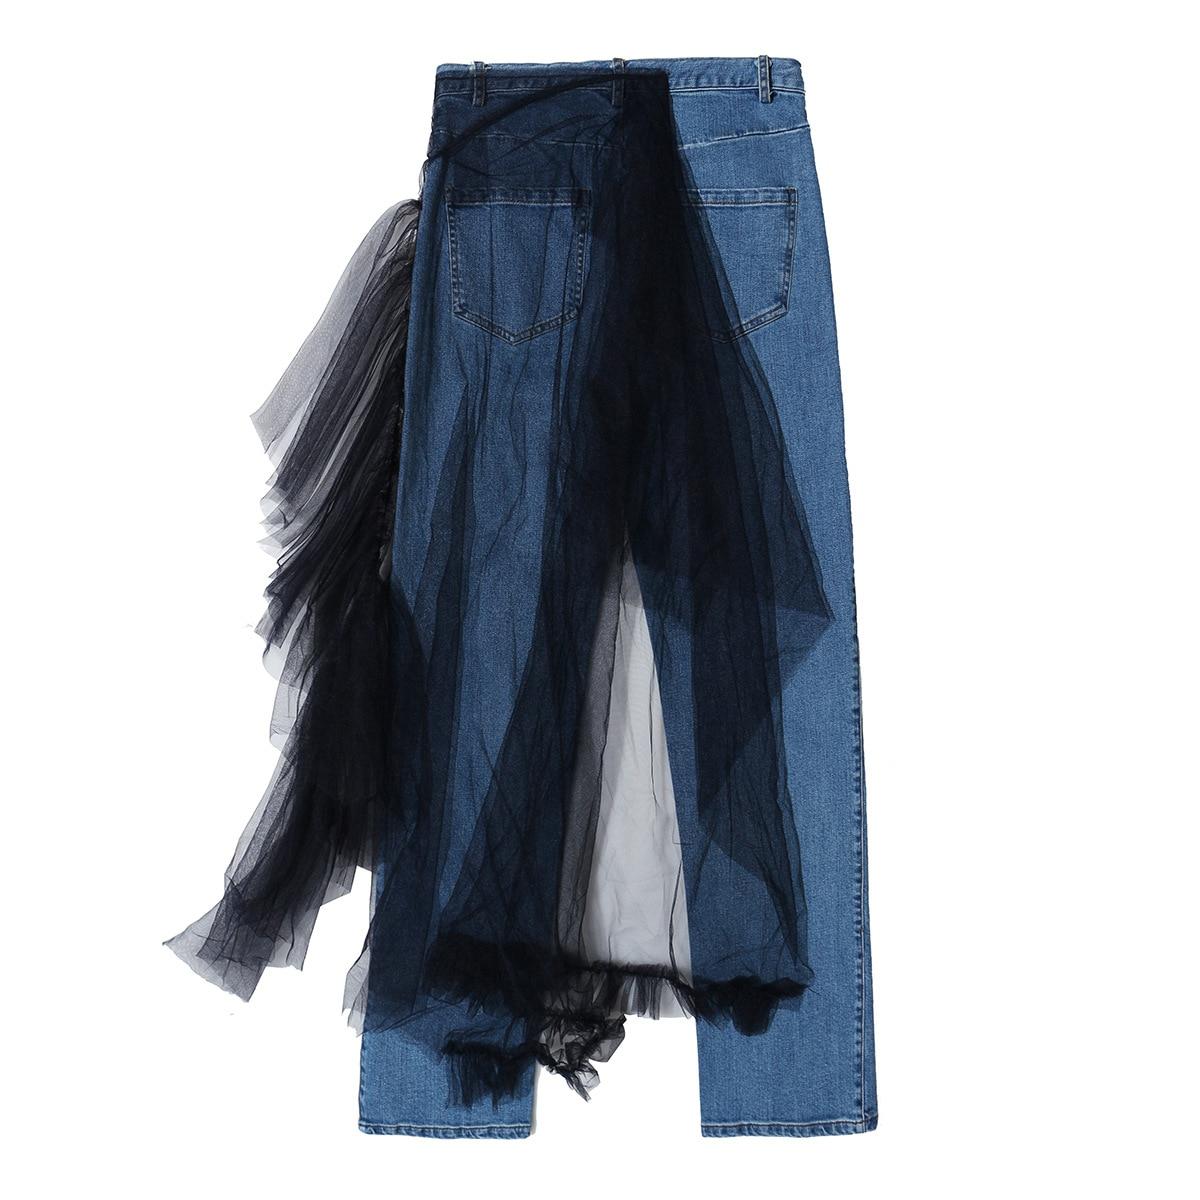 20 s/s irregular empalme personalizado empalme malla madera oreja borde jeans pequeños pies pantalones casuales 2020-04